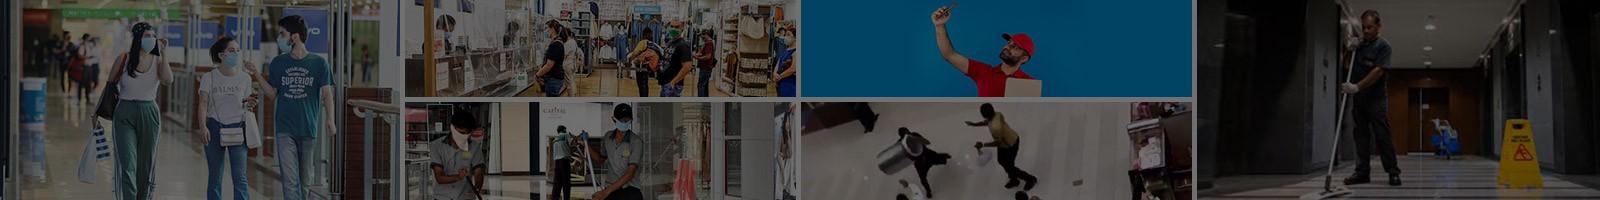 Retail Industry & Video Analytics